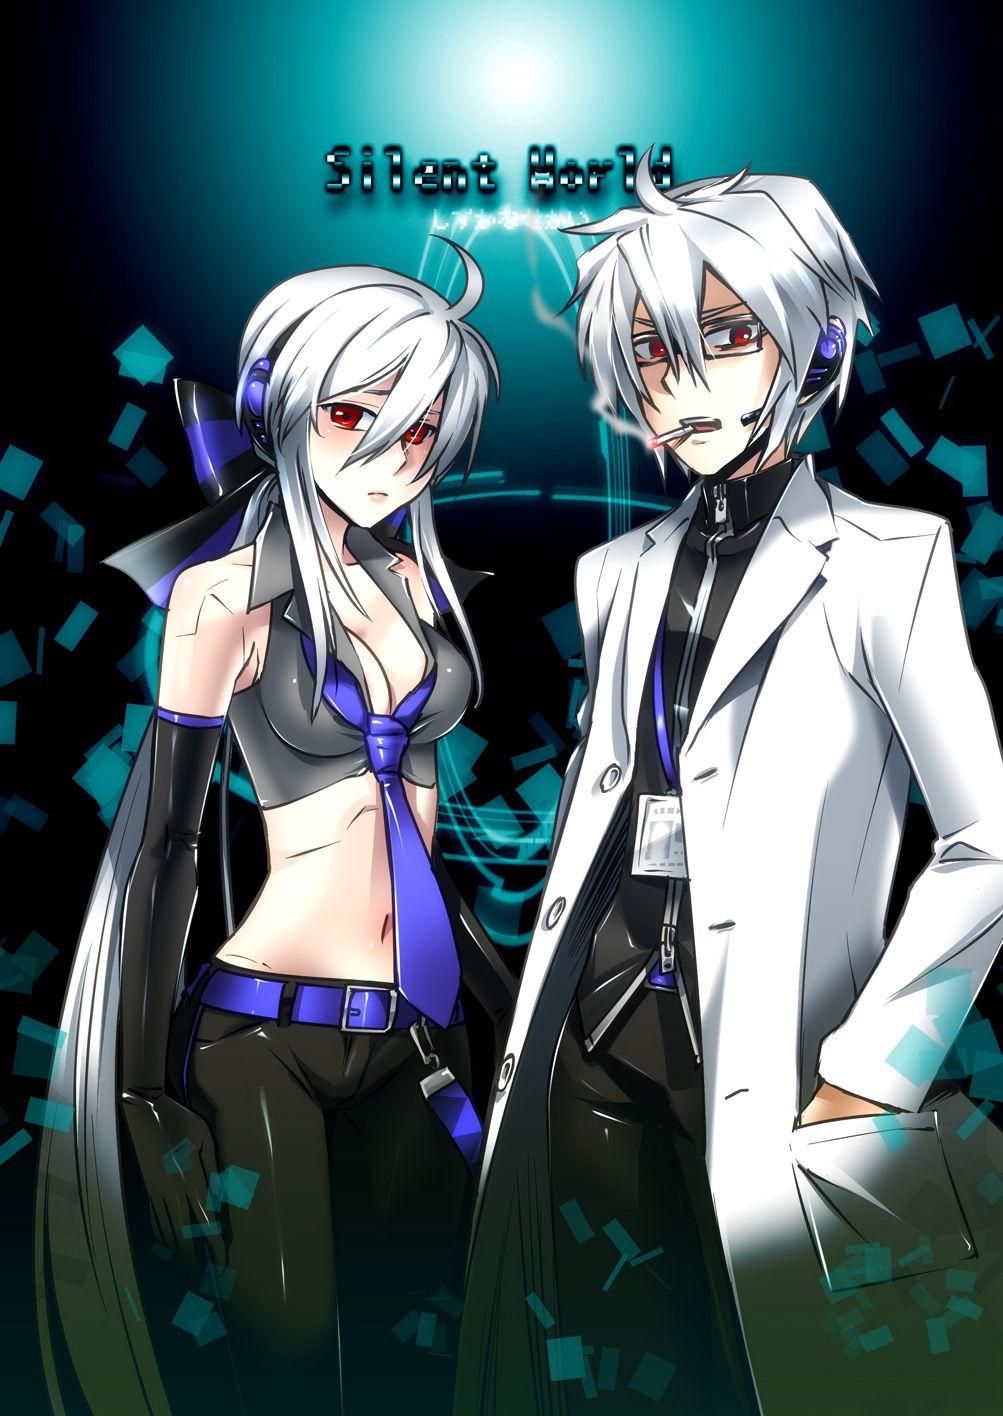 Utauloid Yowane Haku And Honne Dell Vocaloid Vocaloid Characters Anime